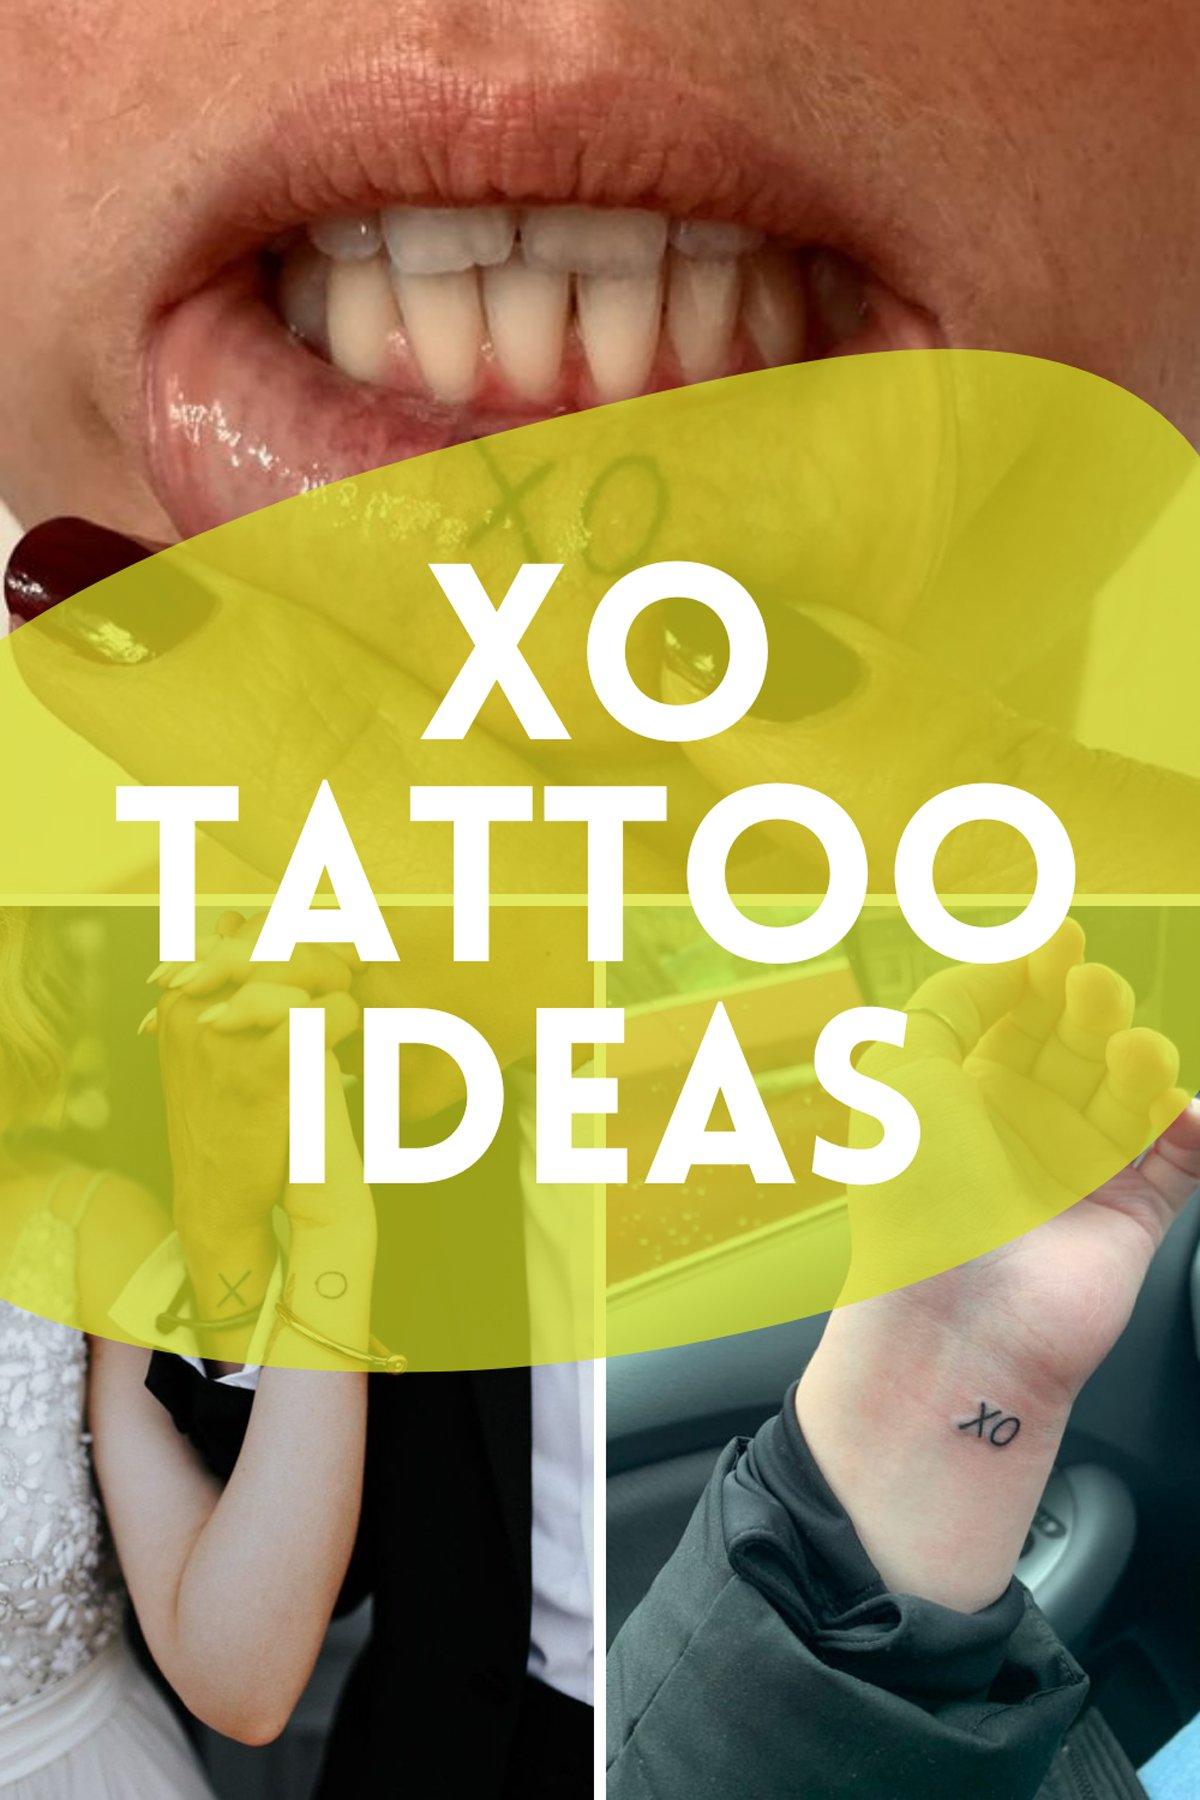 XO Tattoo Ideas